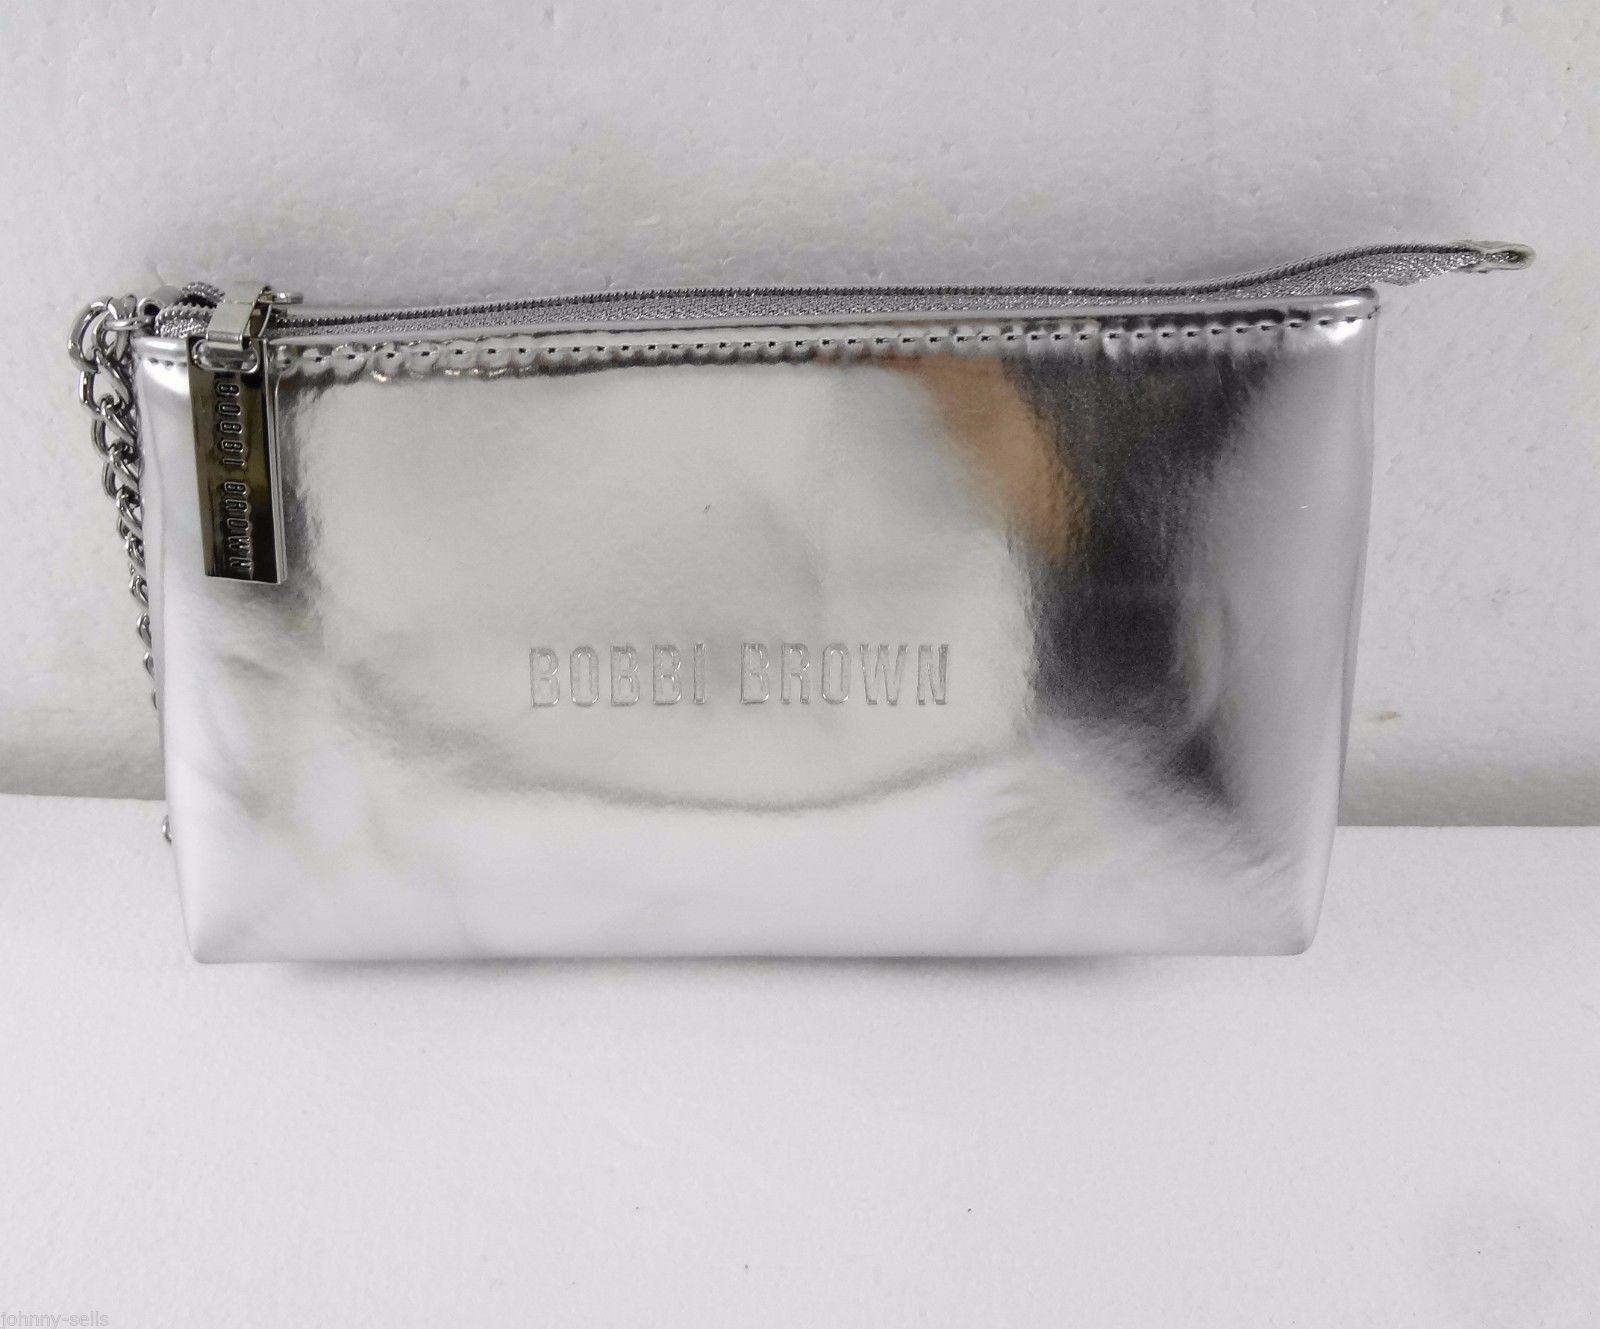 Bobbi Brown Metallic Silver Makeup Bag Cosmetic Case Wristlet Wallet Purse